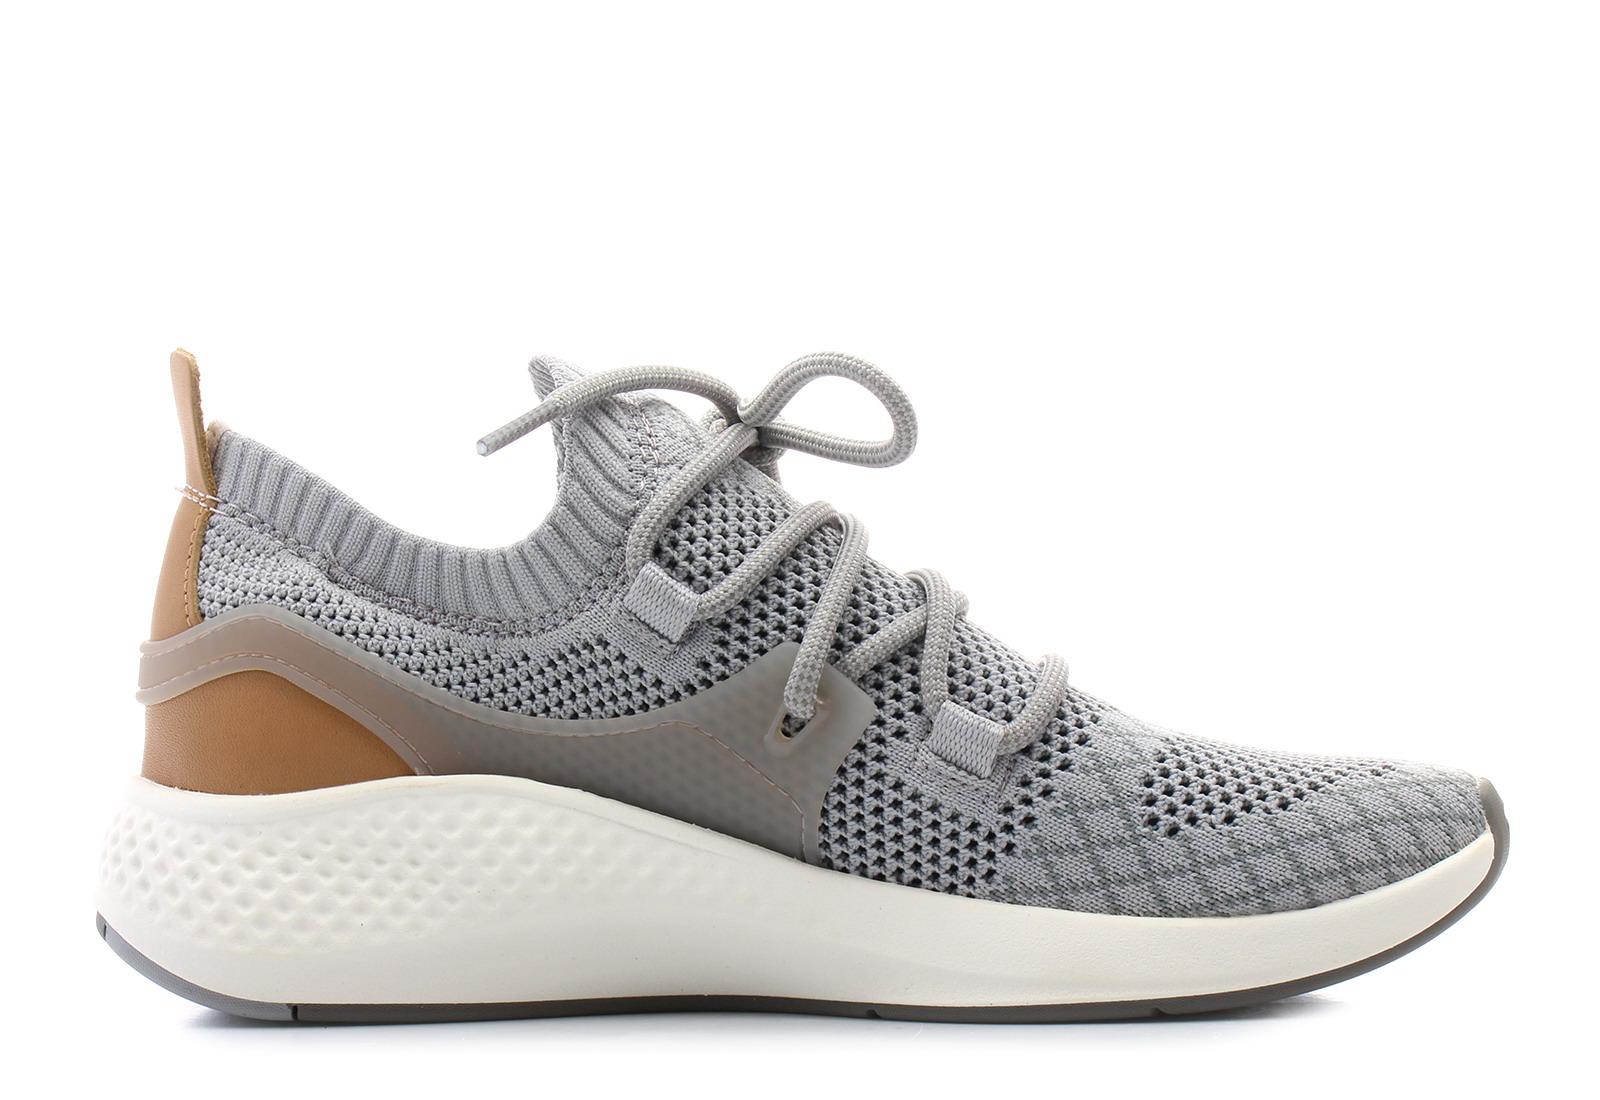 Timberland Shoes Flyroam Go A1su4 Grn Online Shop